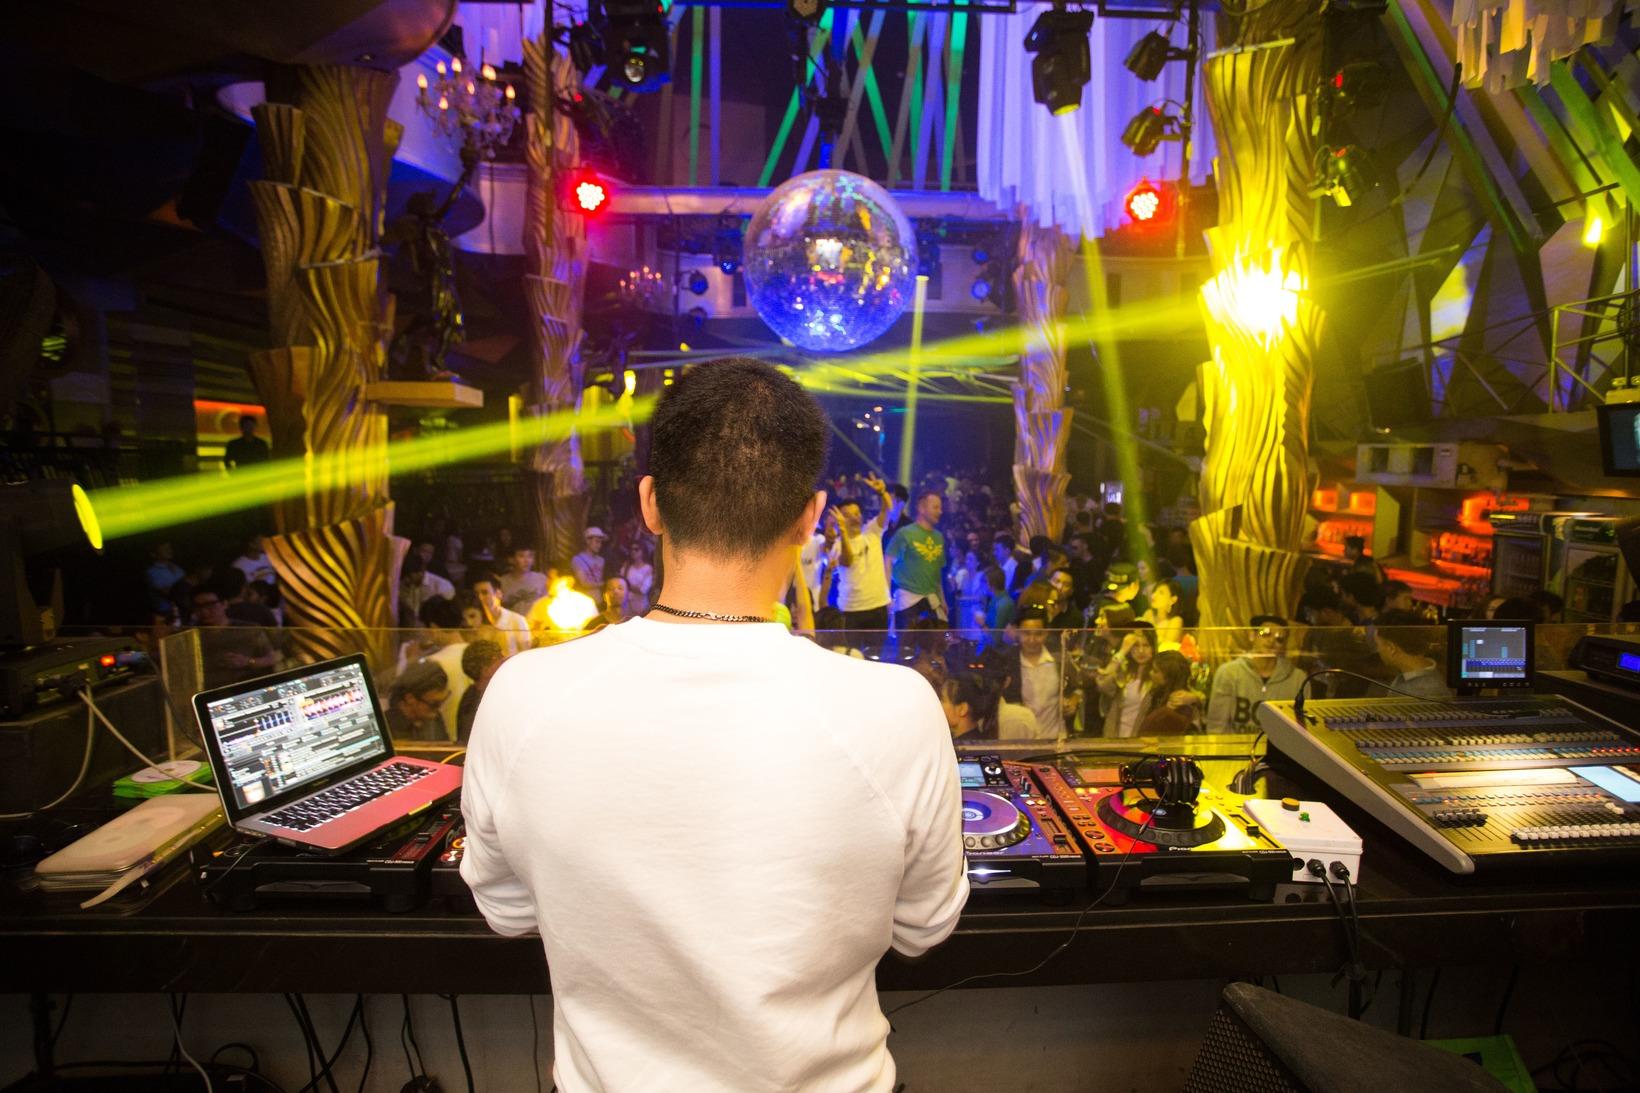 Top 10 Best Nightlife Spots In Siem Reap